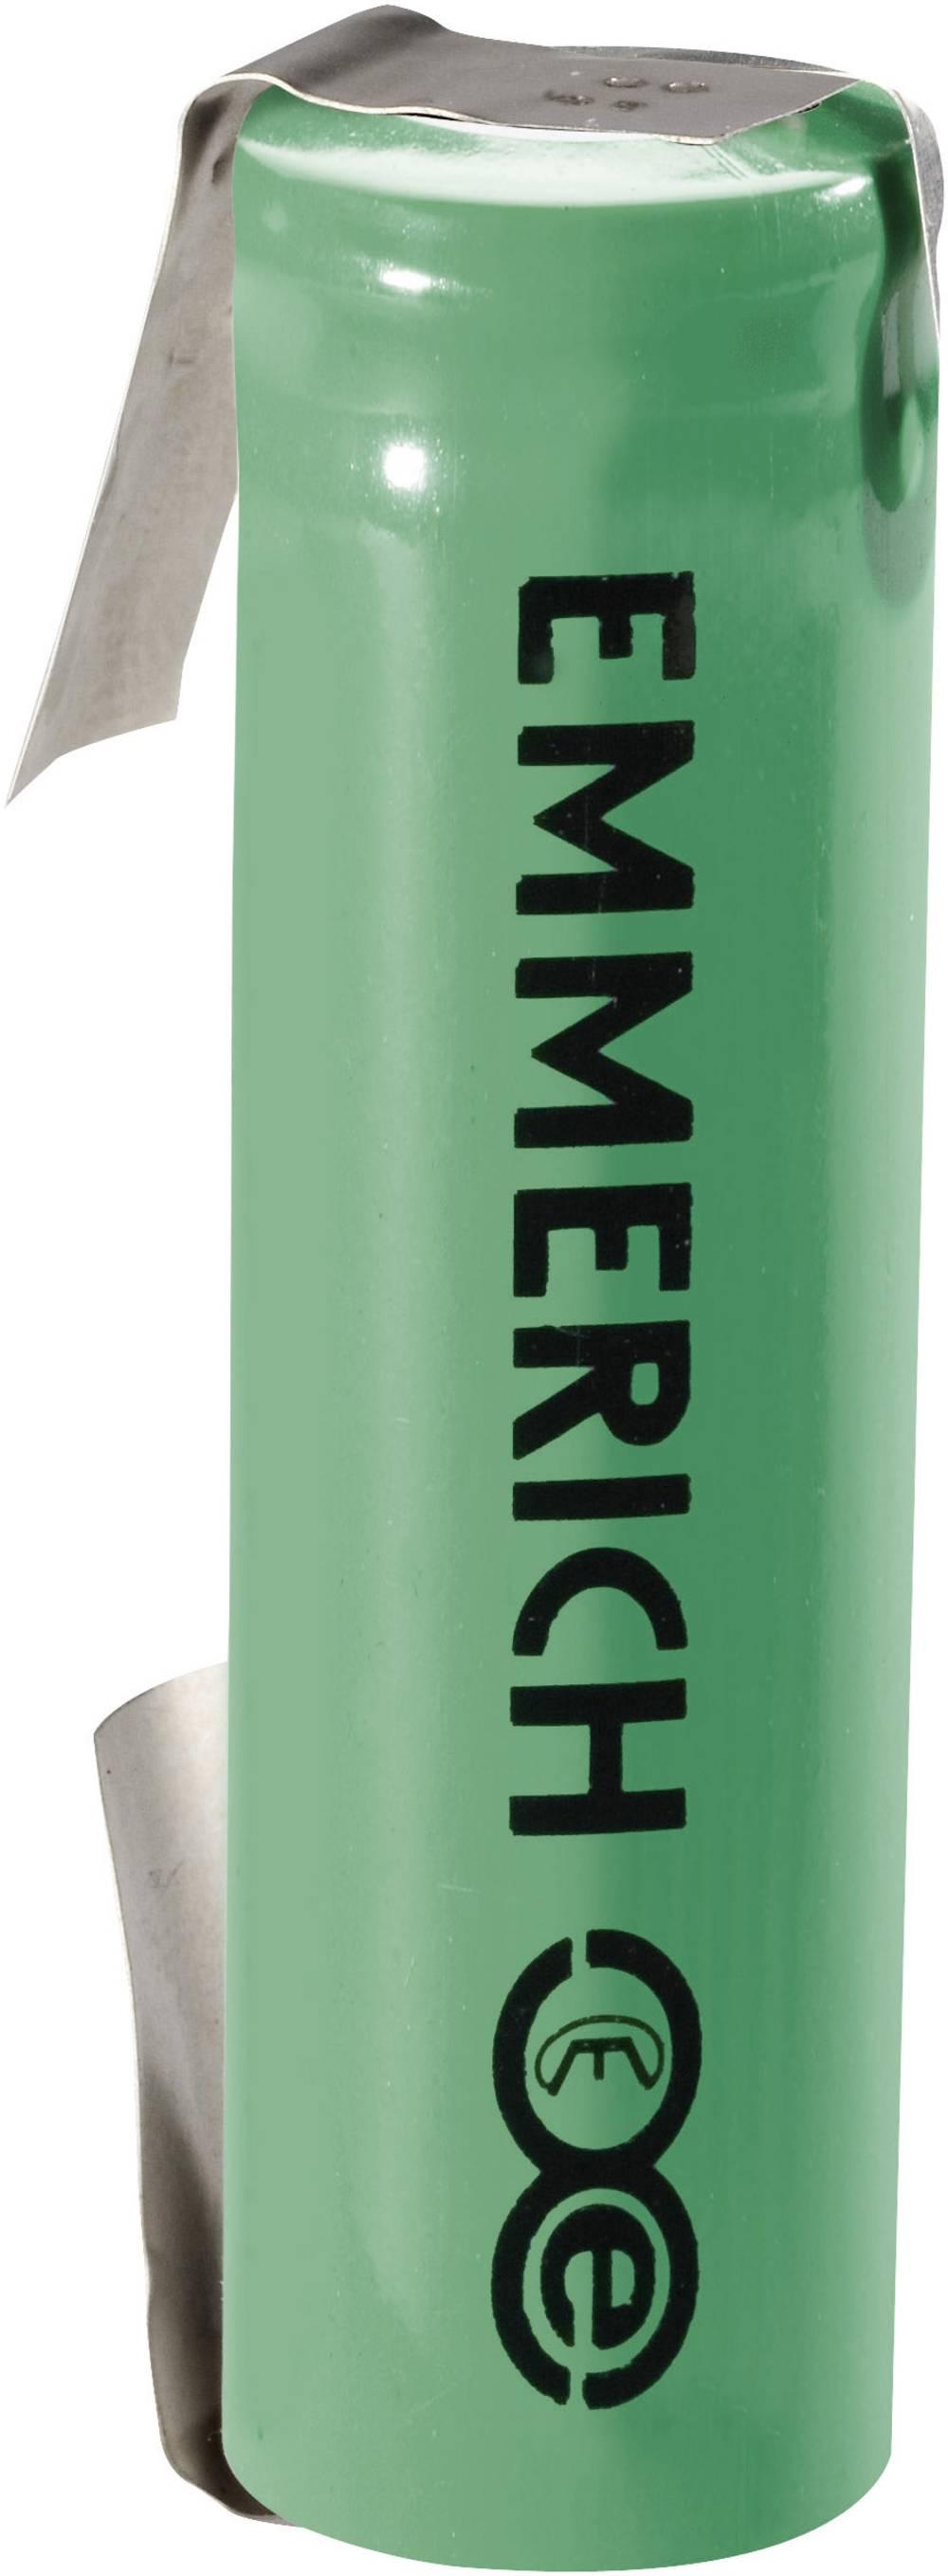 Litij-ionski akumulator s kablom Emmerich 18650V1, ULF 3.6 V 1500 mAh (Ø x V) 18 mm x 65 mm